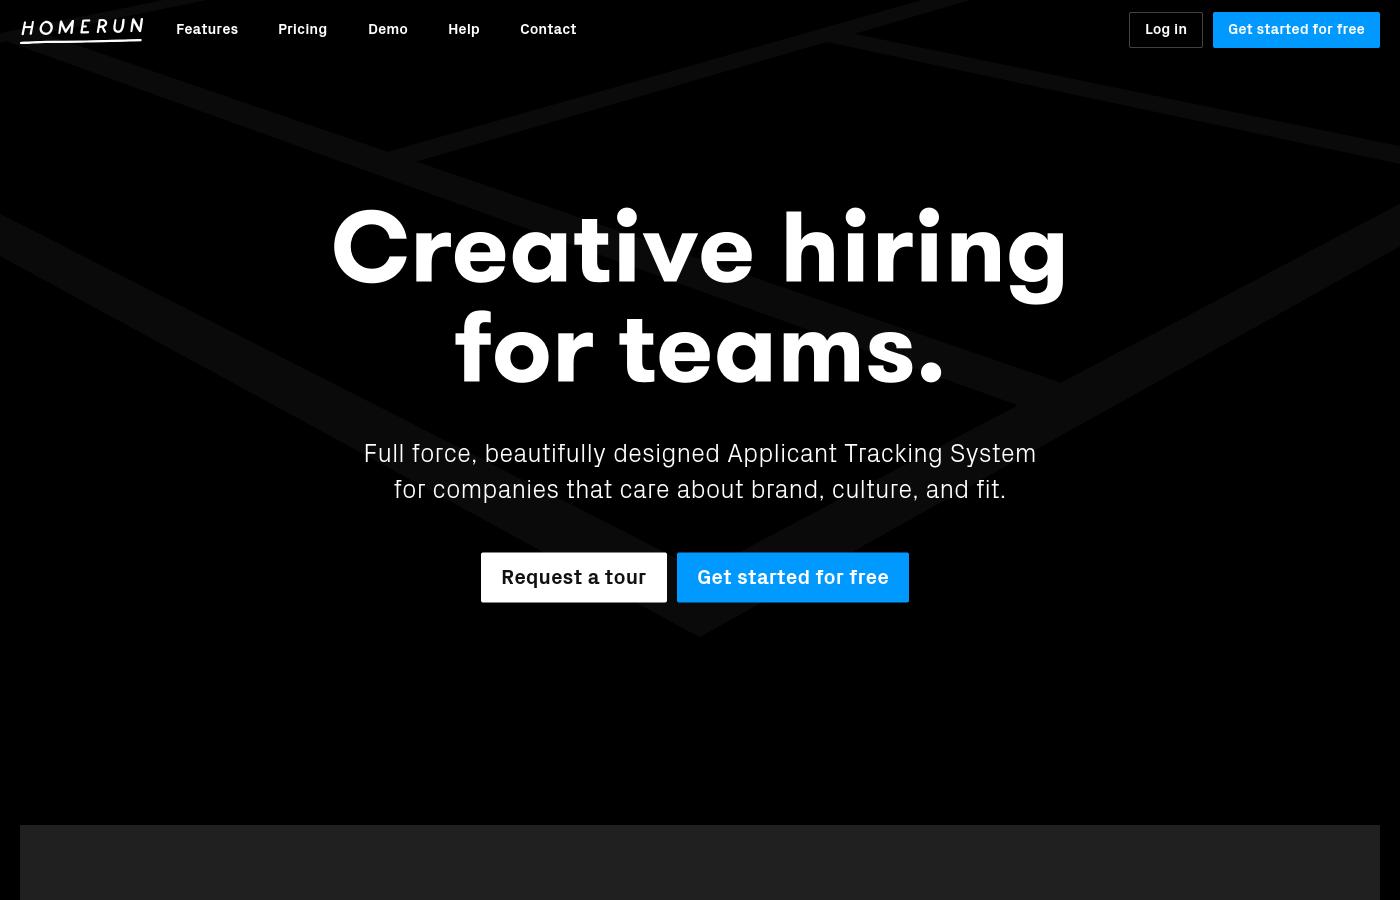 Homerun Growth Hacking Tools